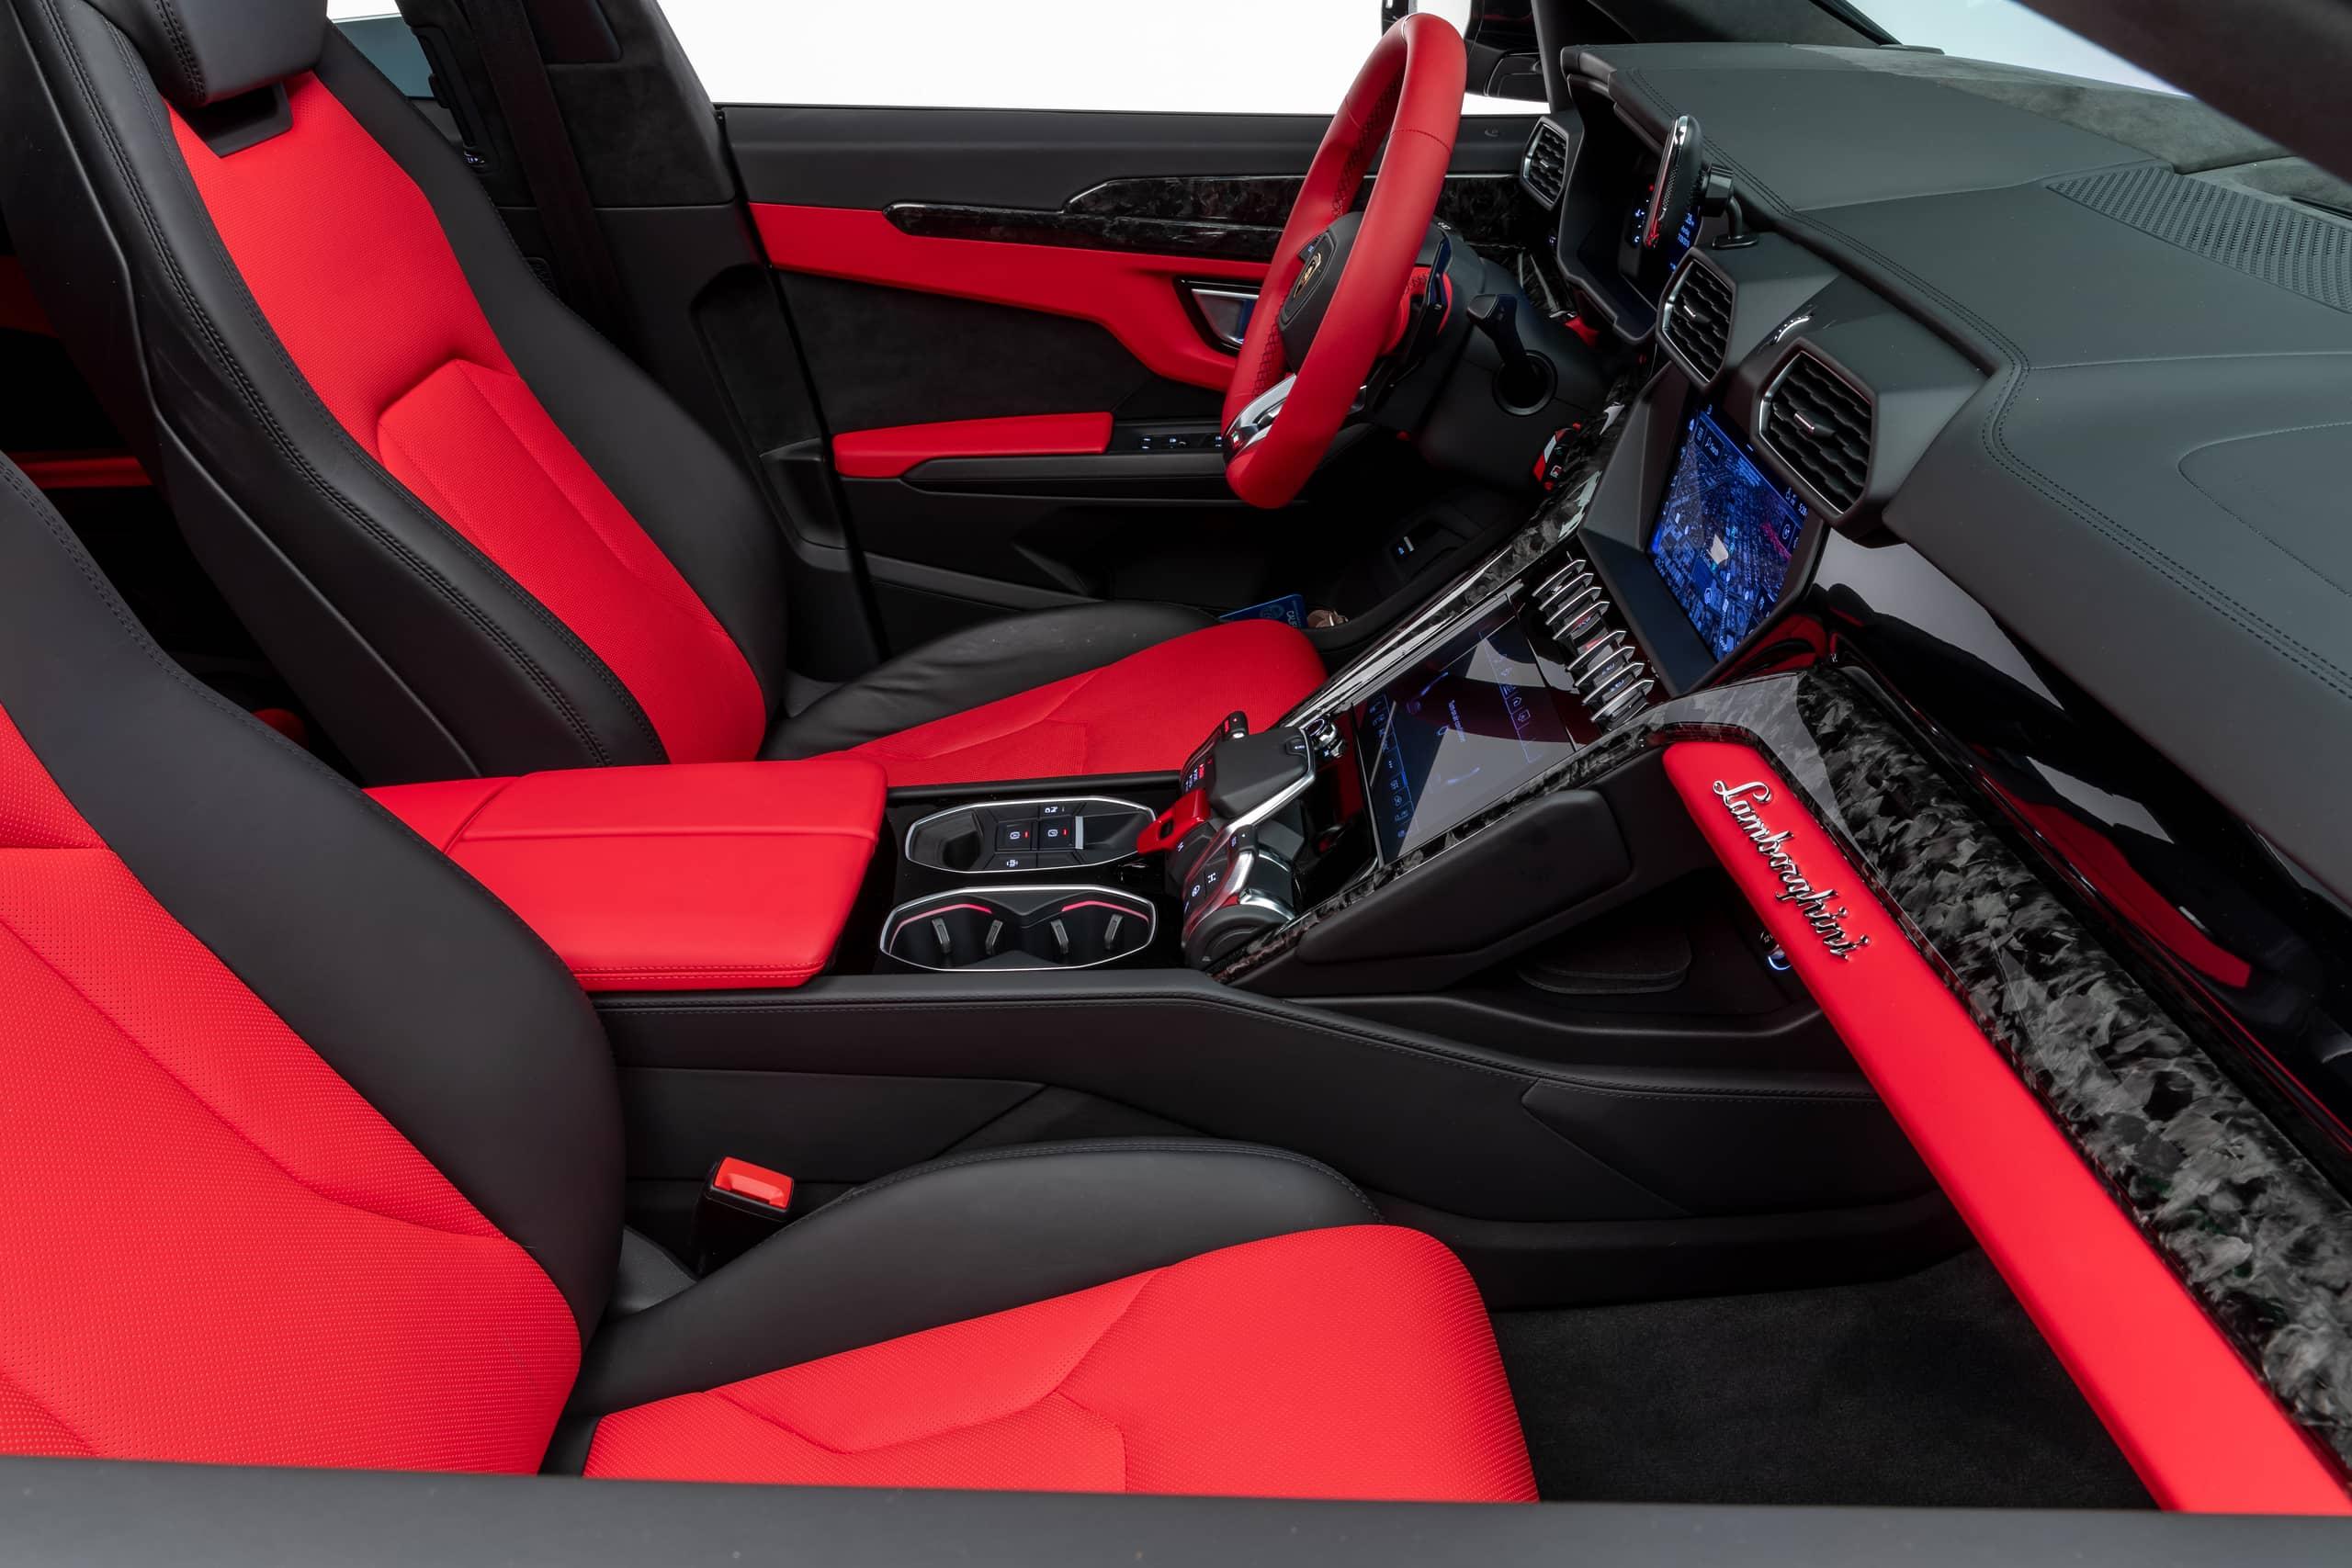 Lamborghini-Urus-by-1016-Industries-37